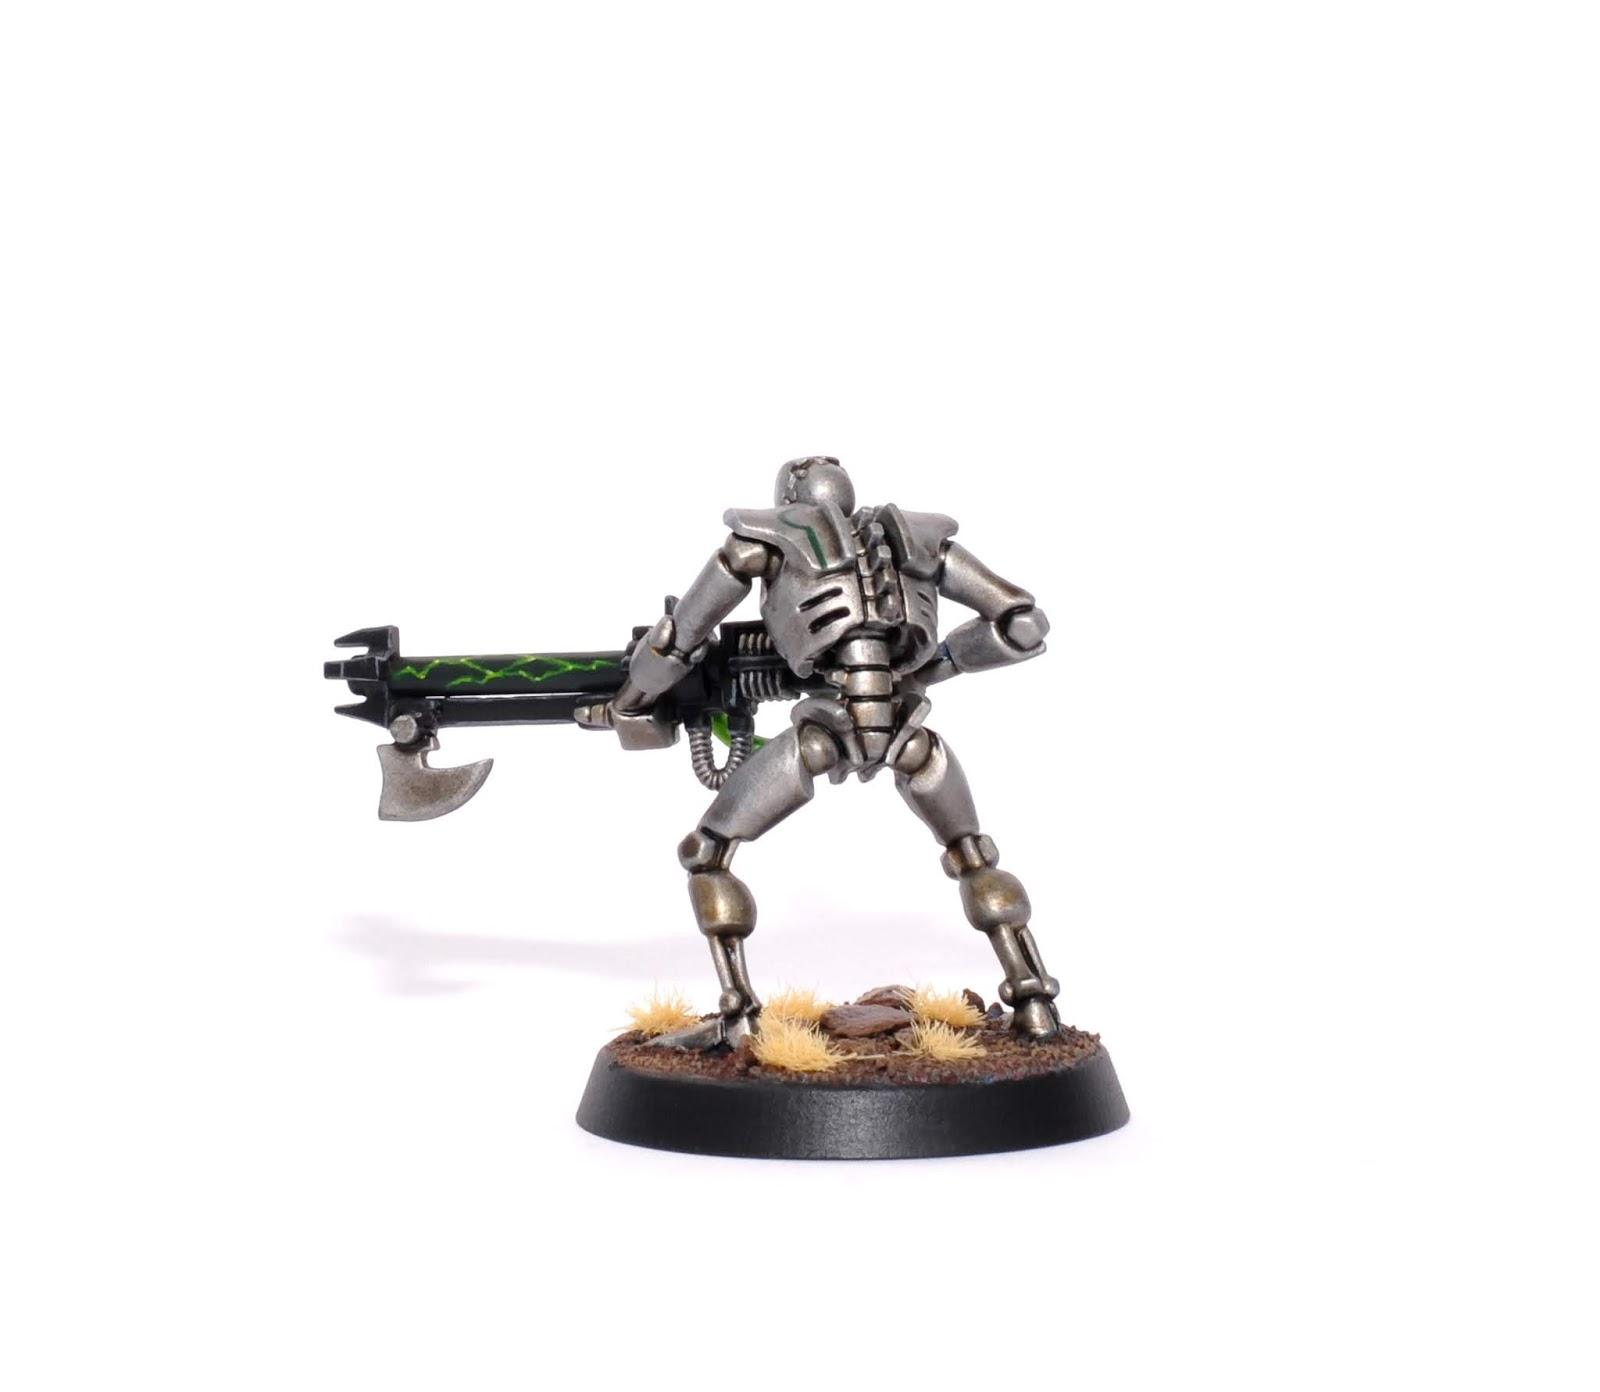 40K Necrons /_Necron Warrior Single Figure Blind Buy Bits